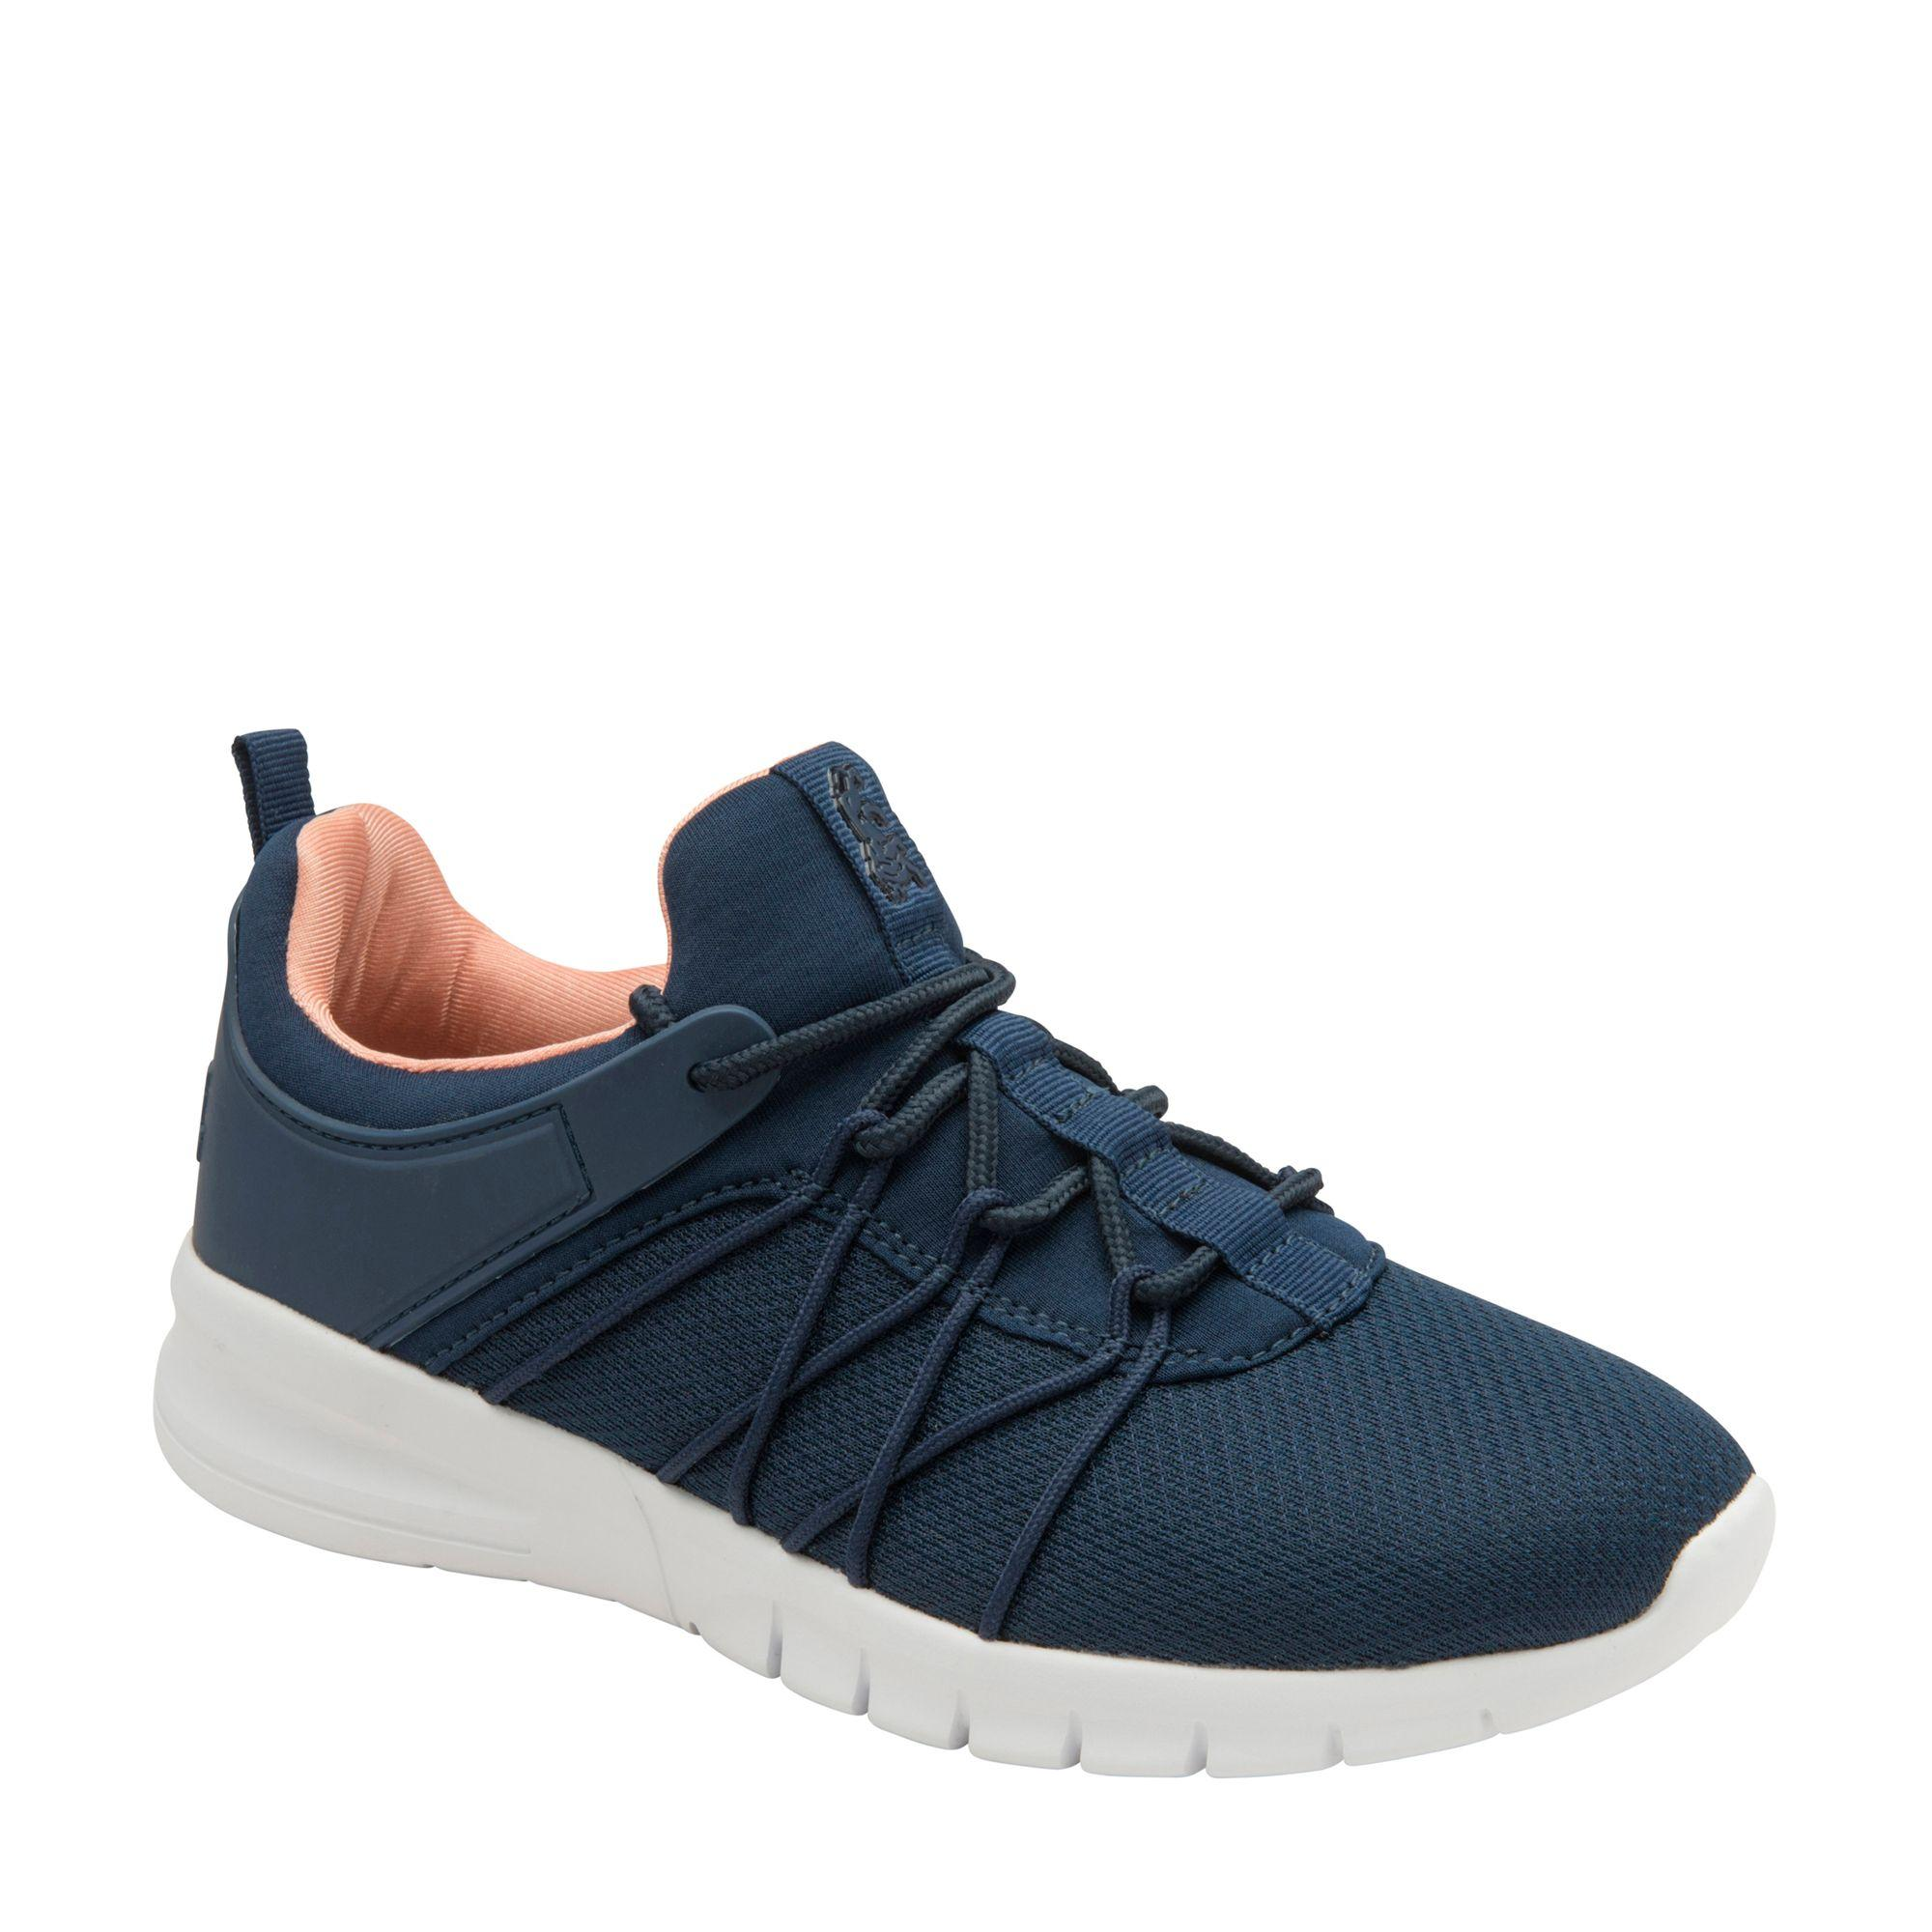 Lonsdale Regent Ladies Court Sneakers